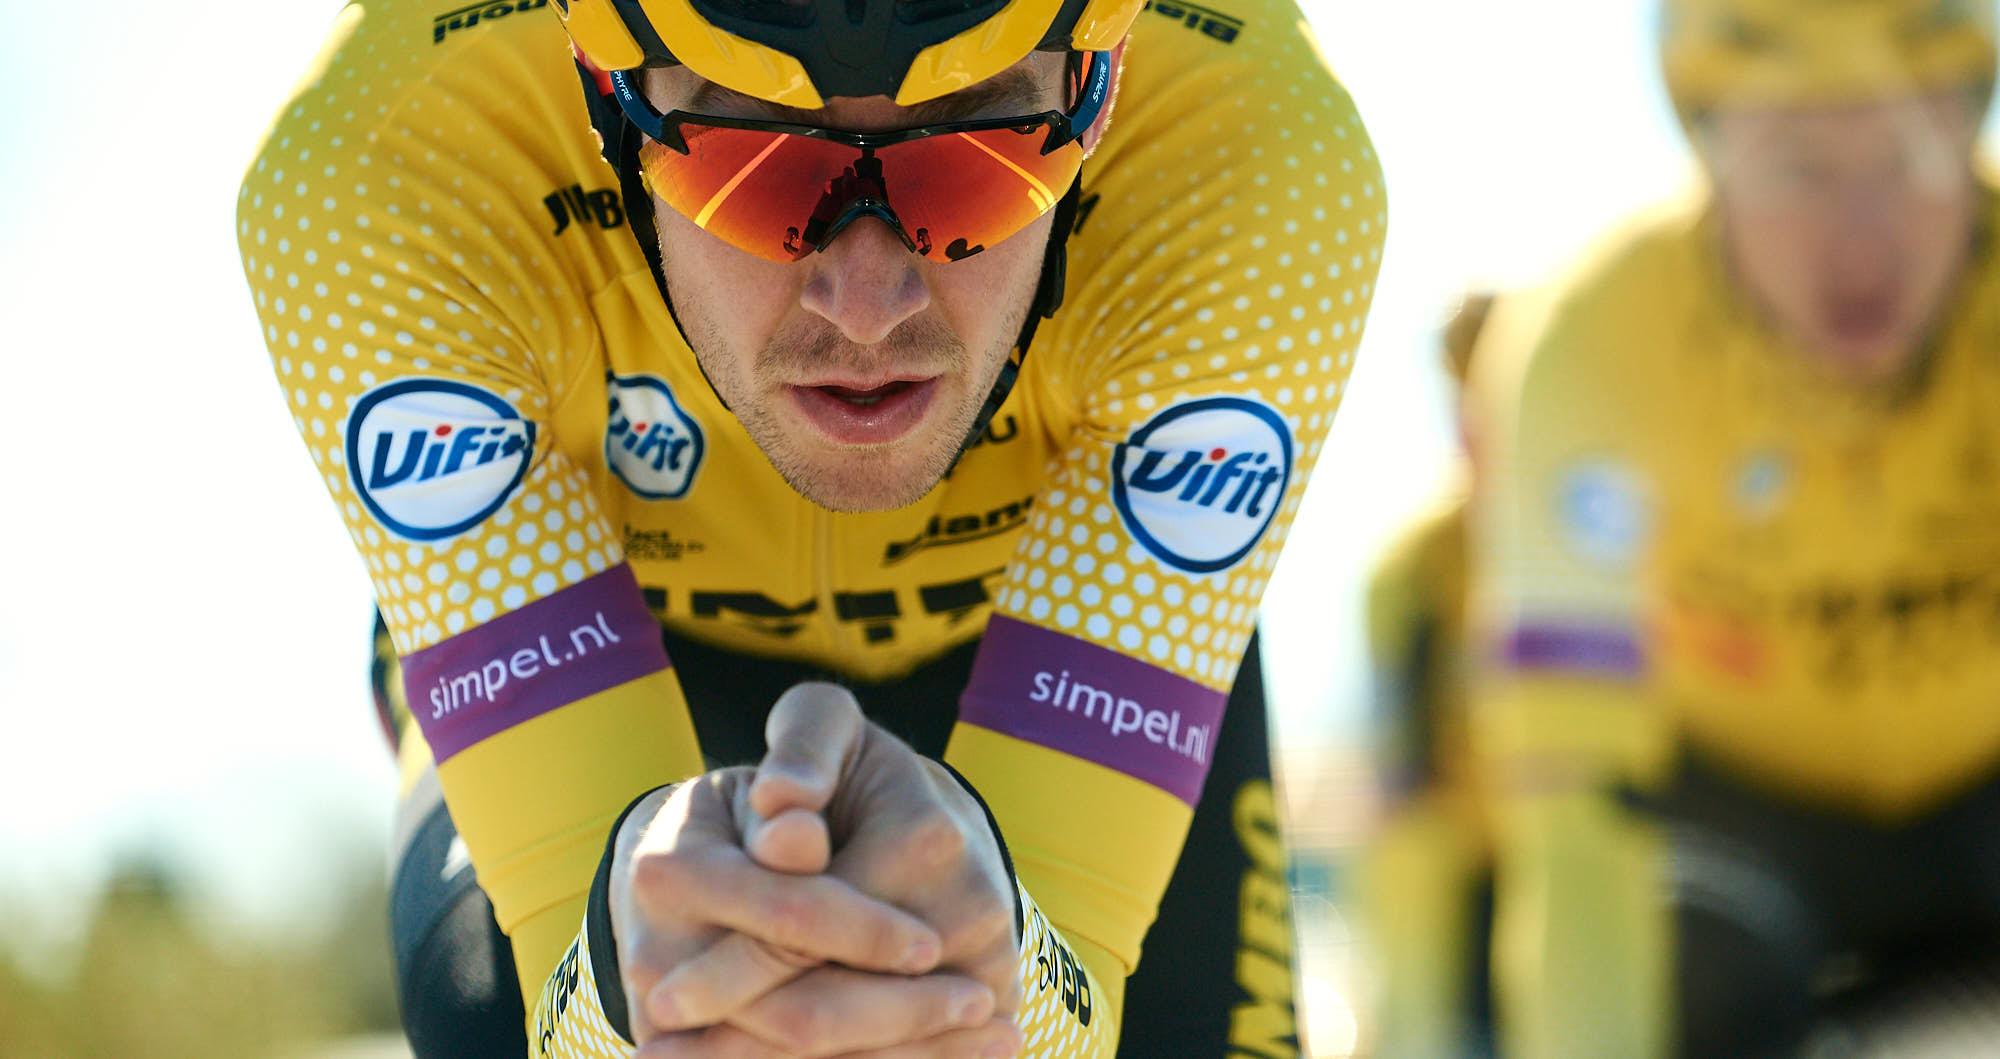 Laurens de Plus from Belgium during time trial